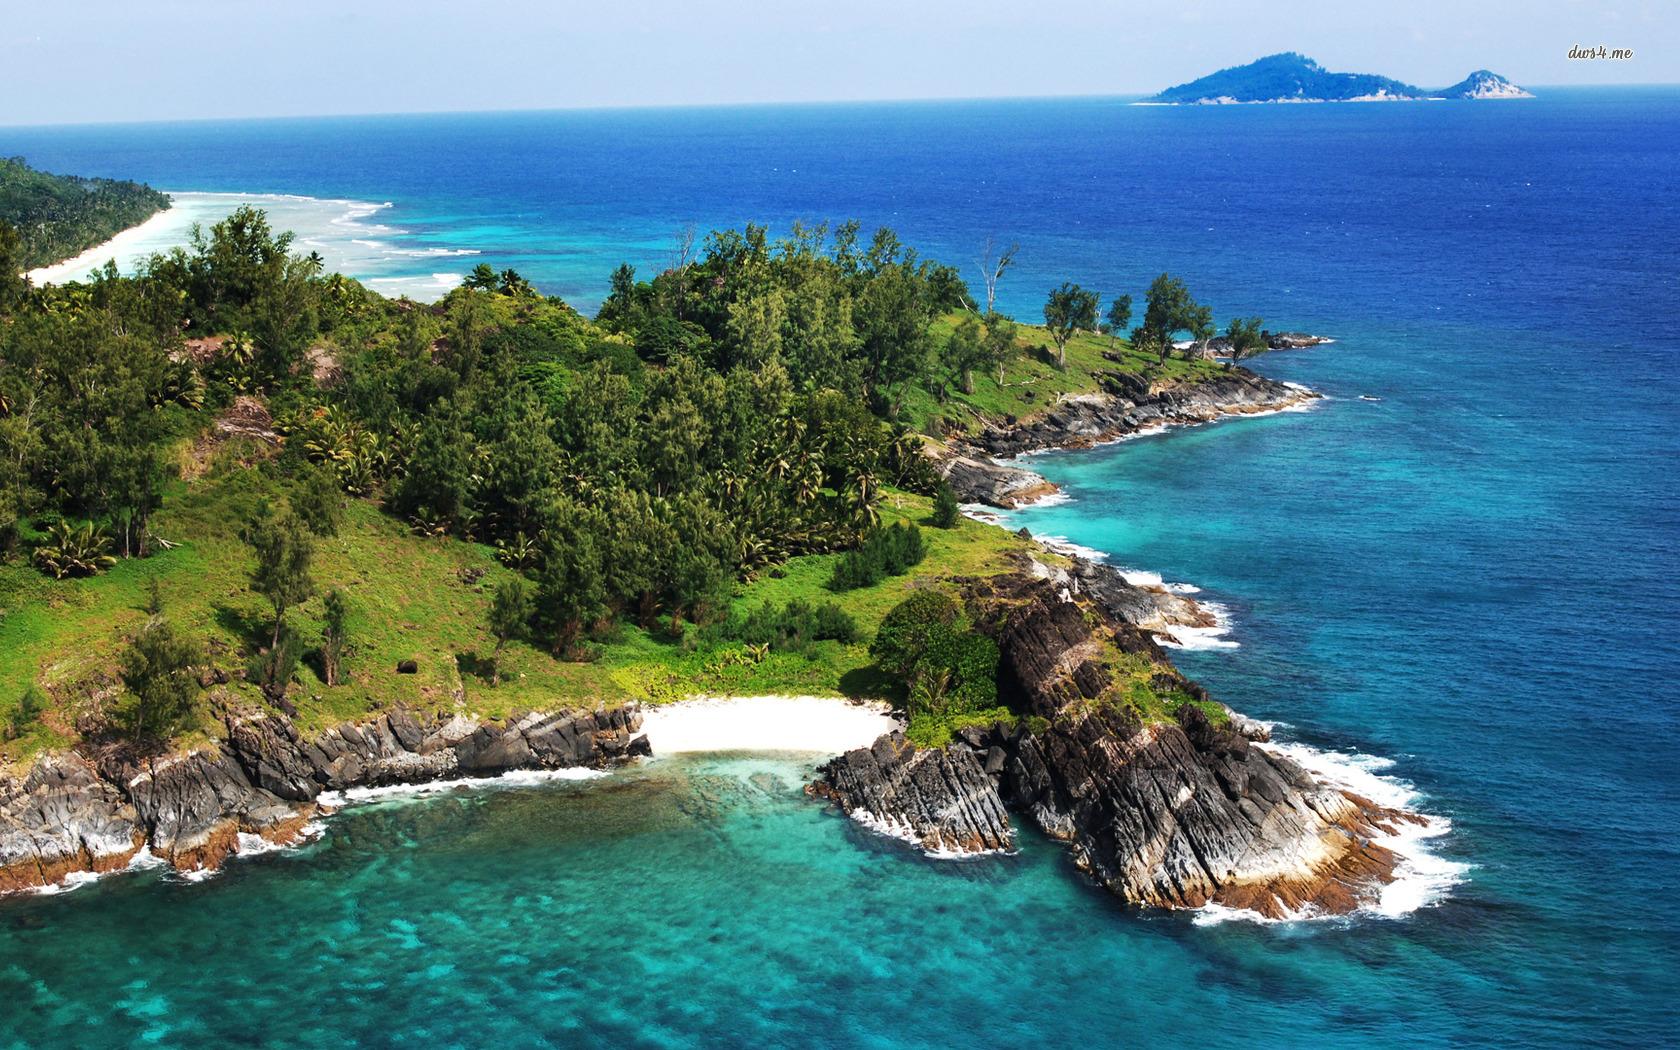 塞舌尔斯尔豪特岛<br/>Silhouette Island, Seychelles